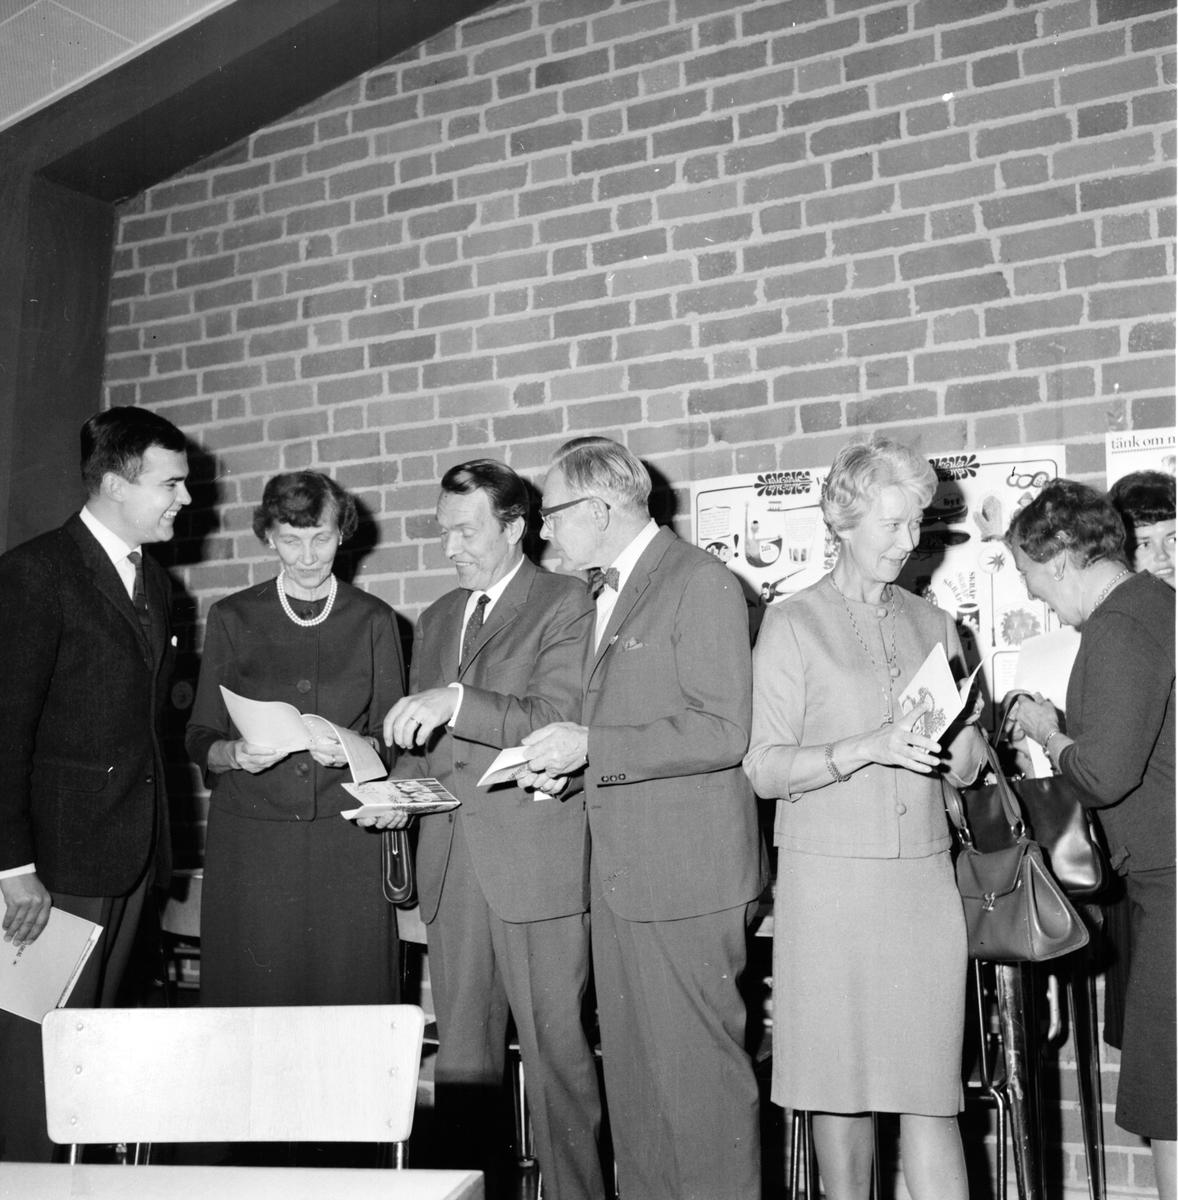 Sparbanksmöte, Centralskolan, 22 September 1964